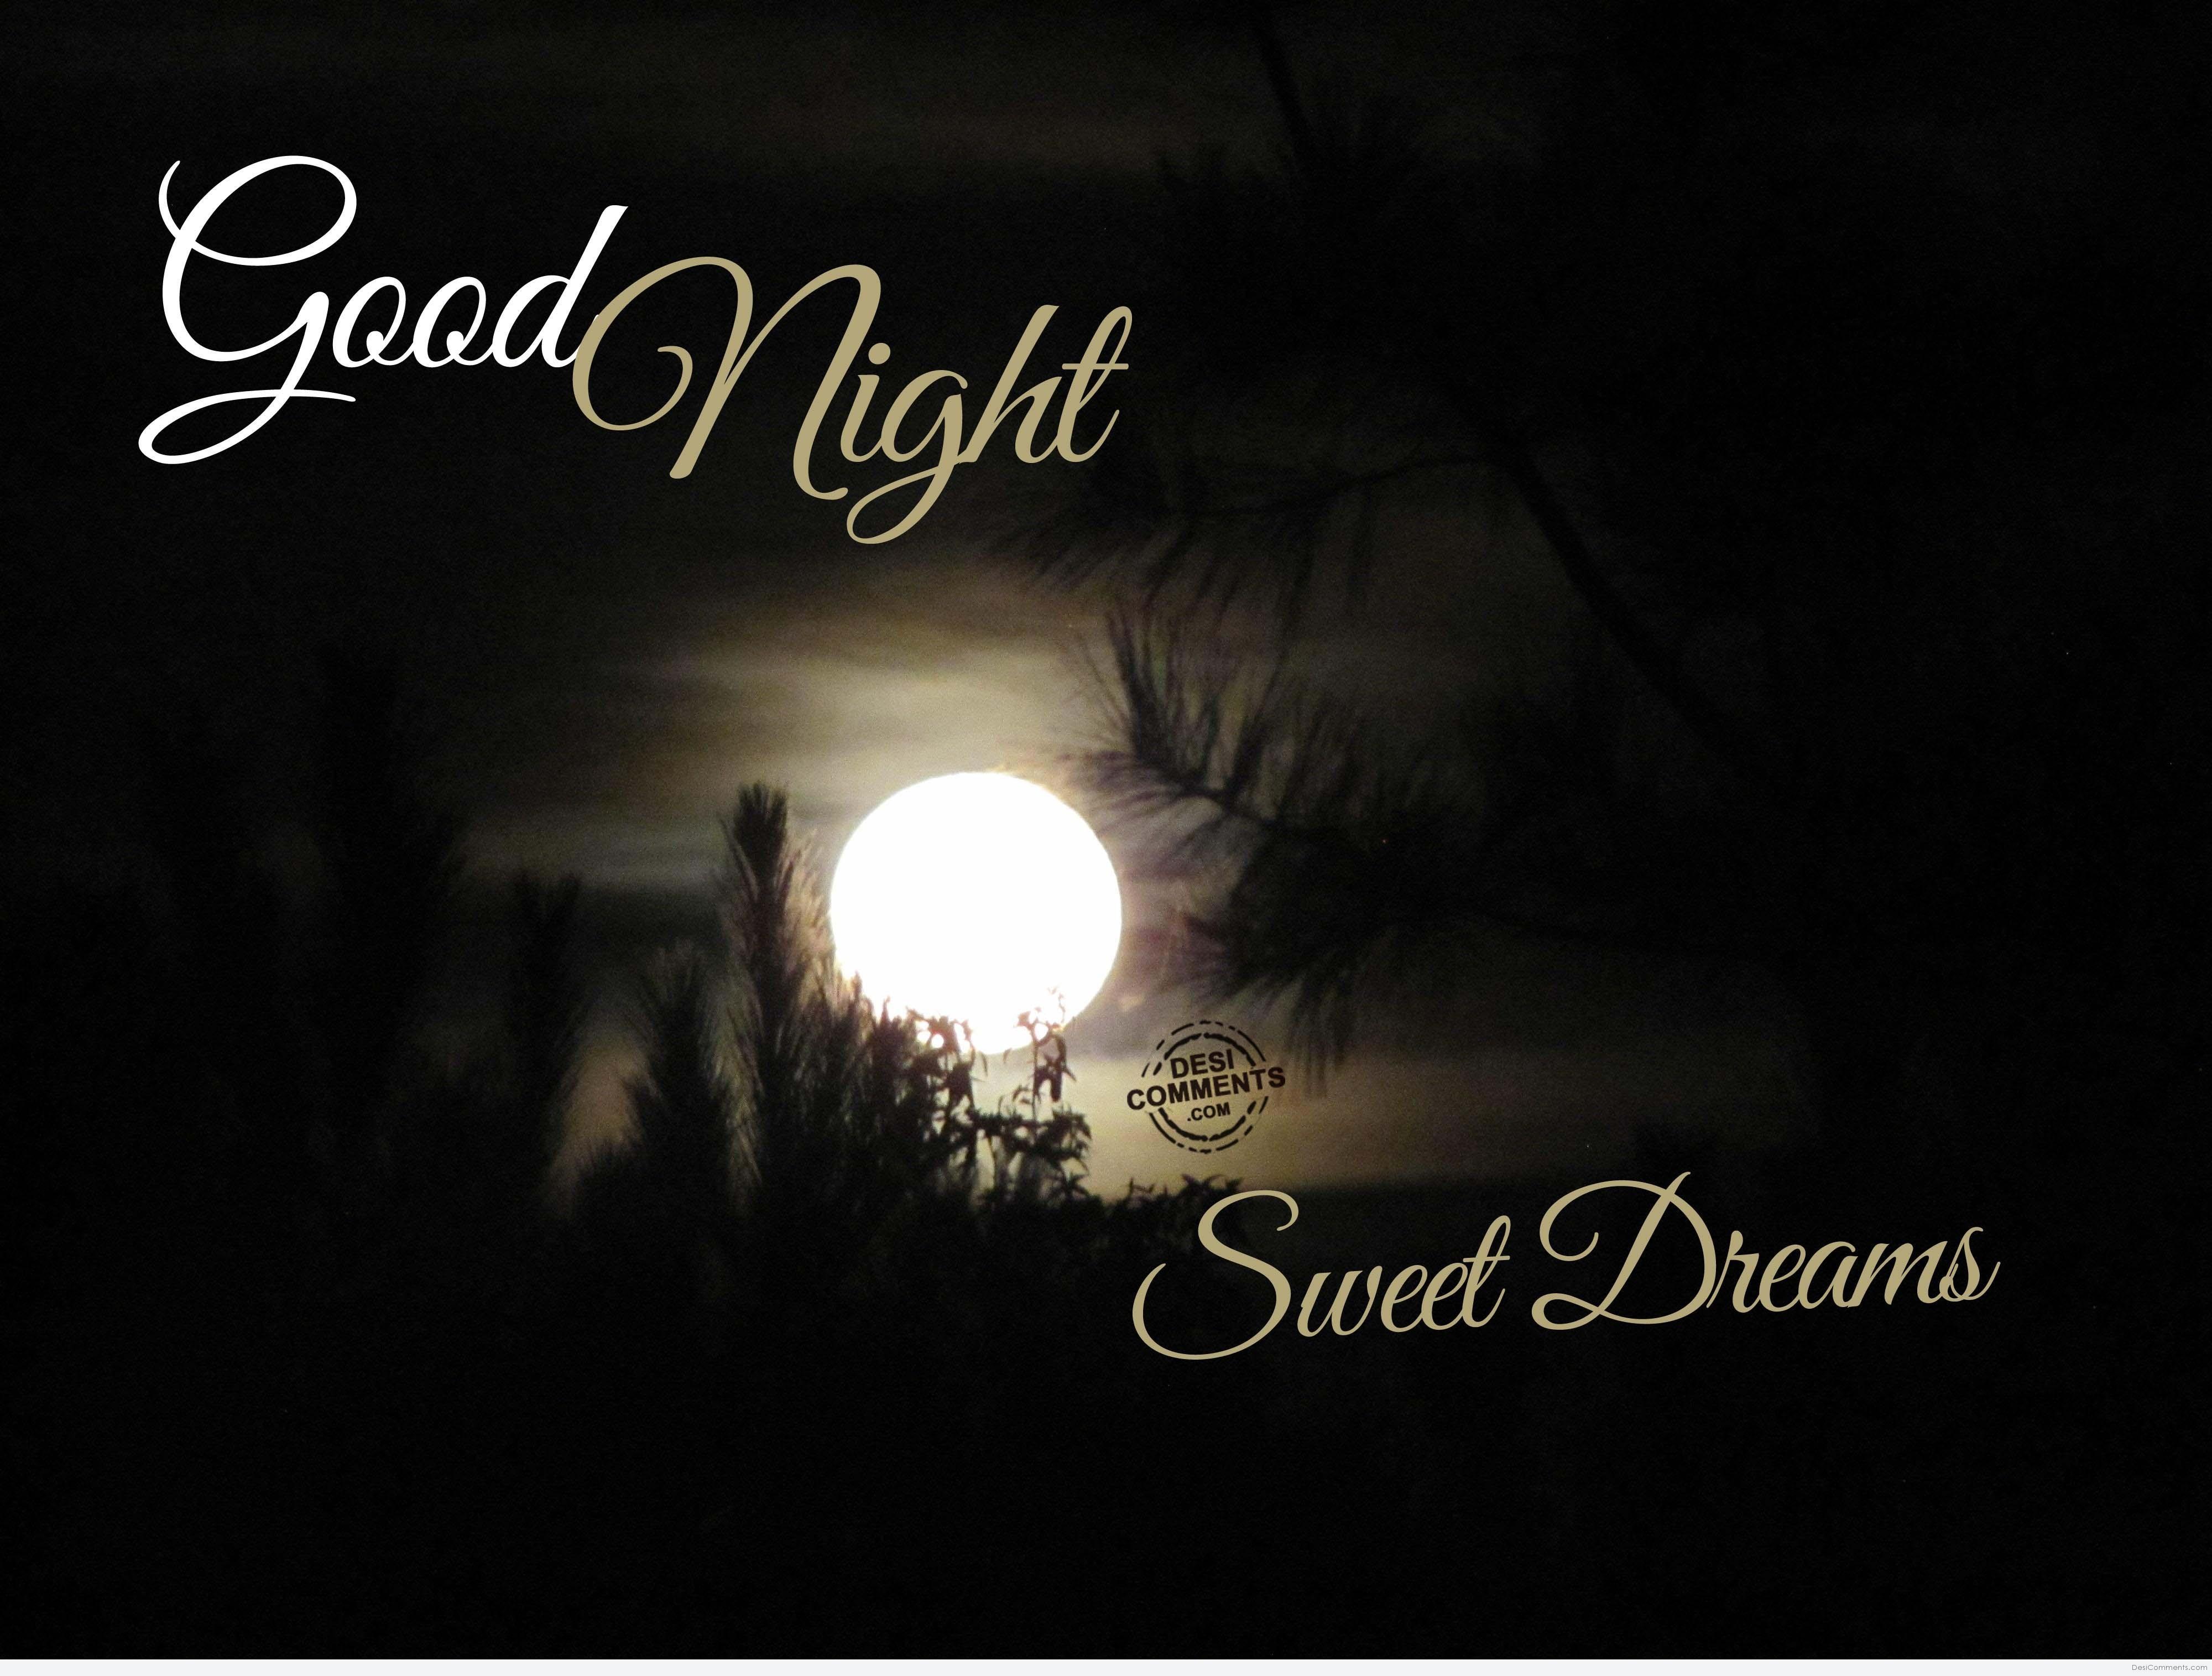 Good Night, Sweet Dreams - DesiComments.com